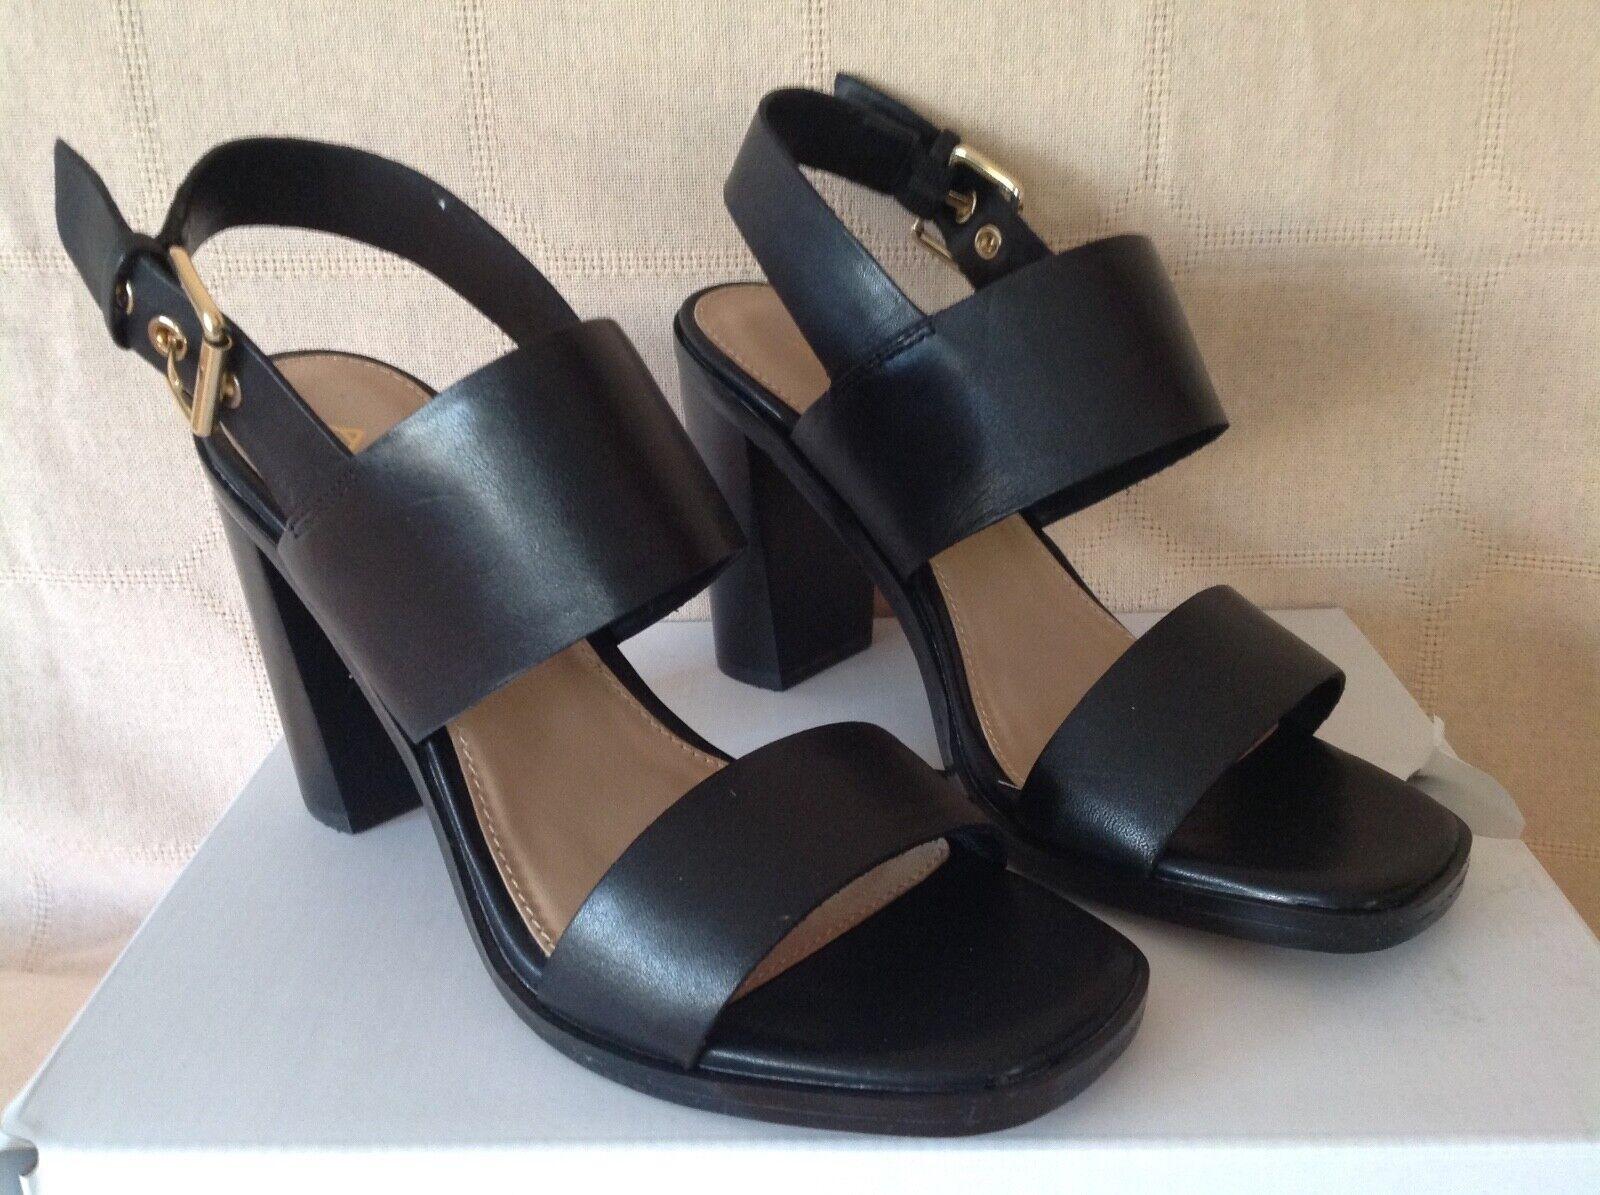 Aldo Black leather heeled sandals size 3. BNWT rrp